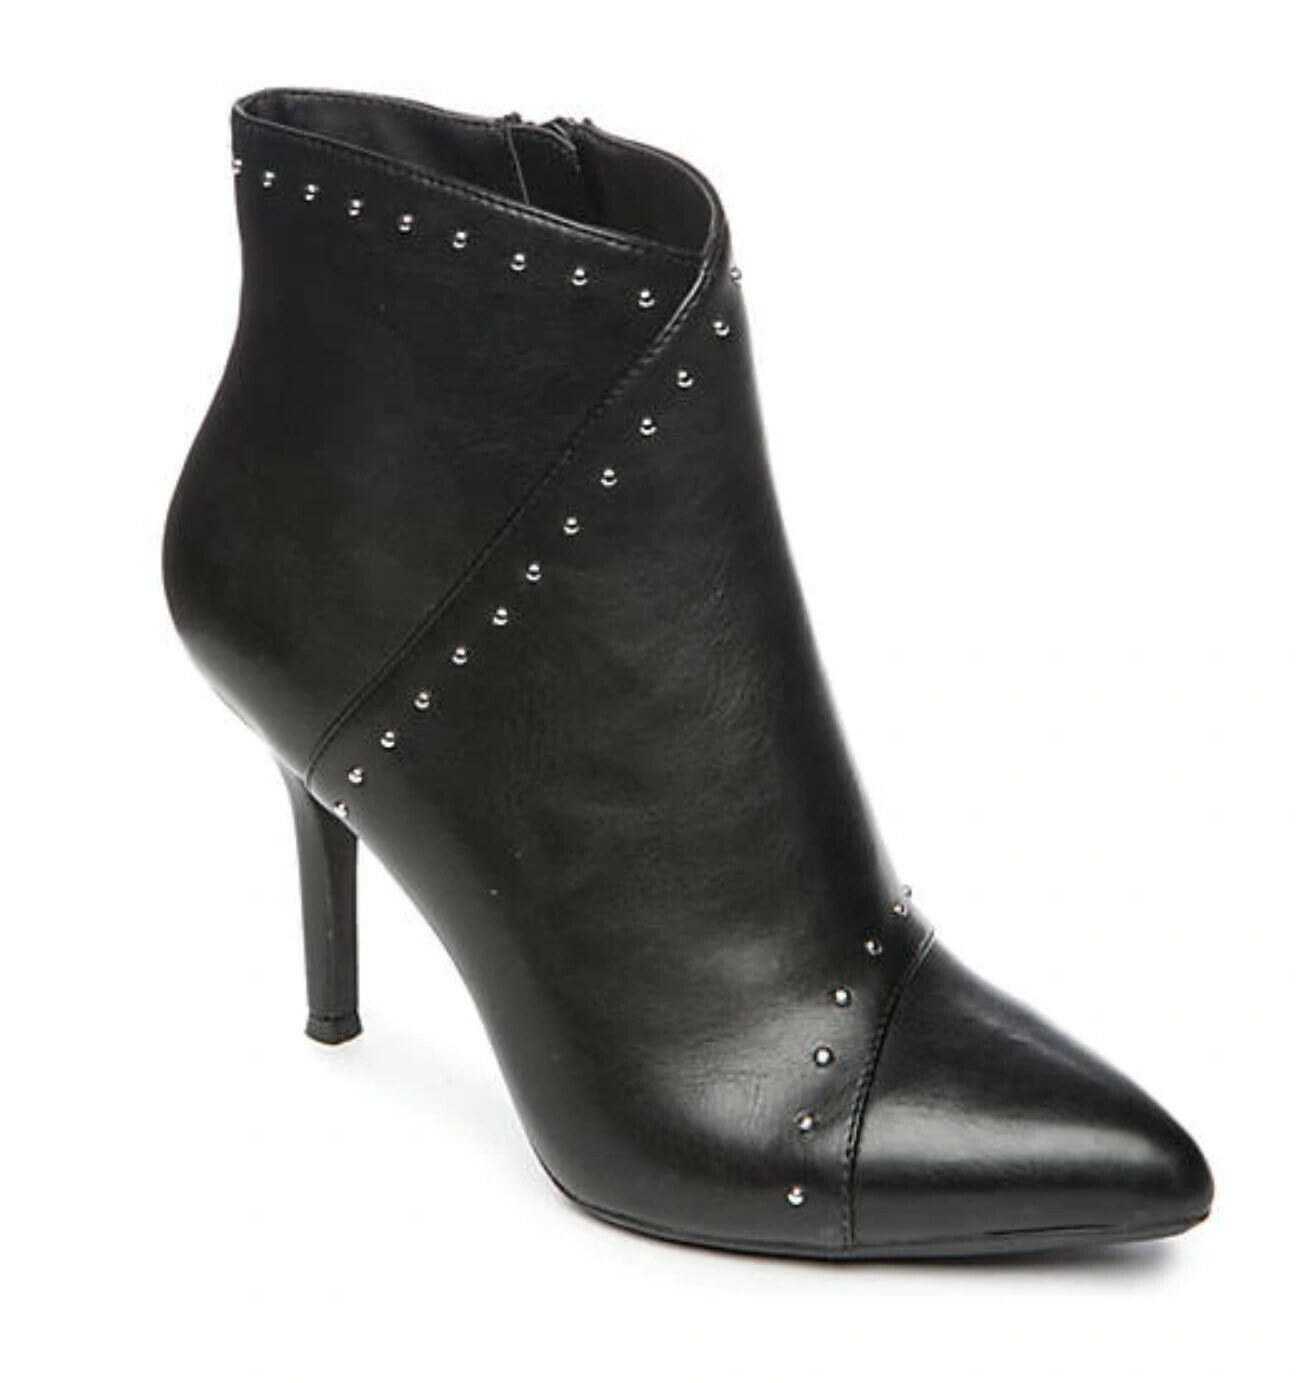 The Limited Women's Trixa Bootie In Subtle Studs Black Size 7.5M